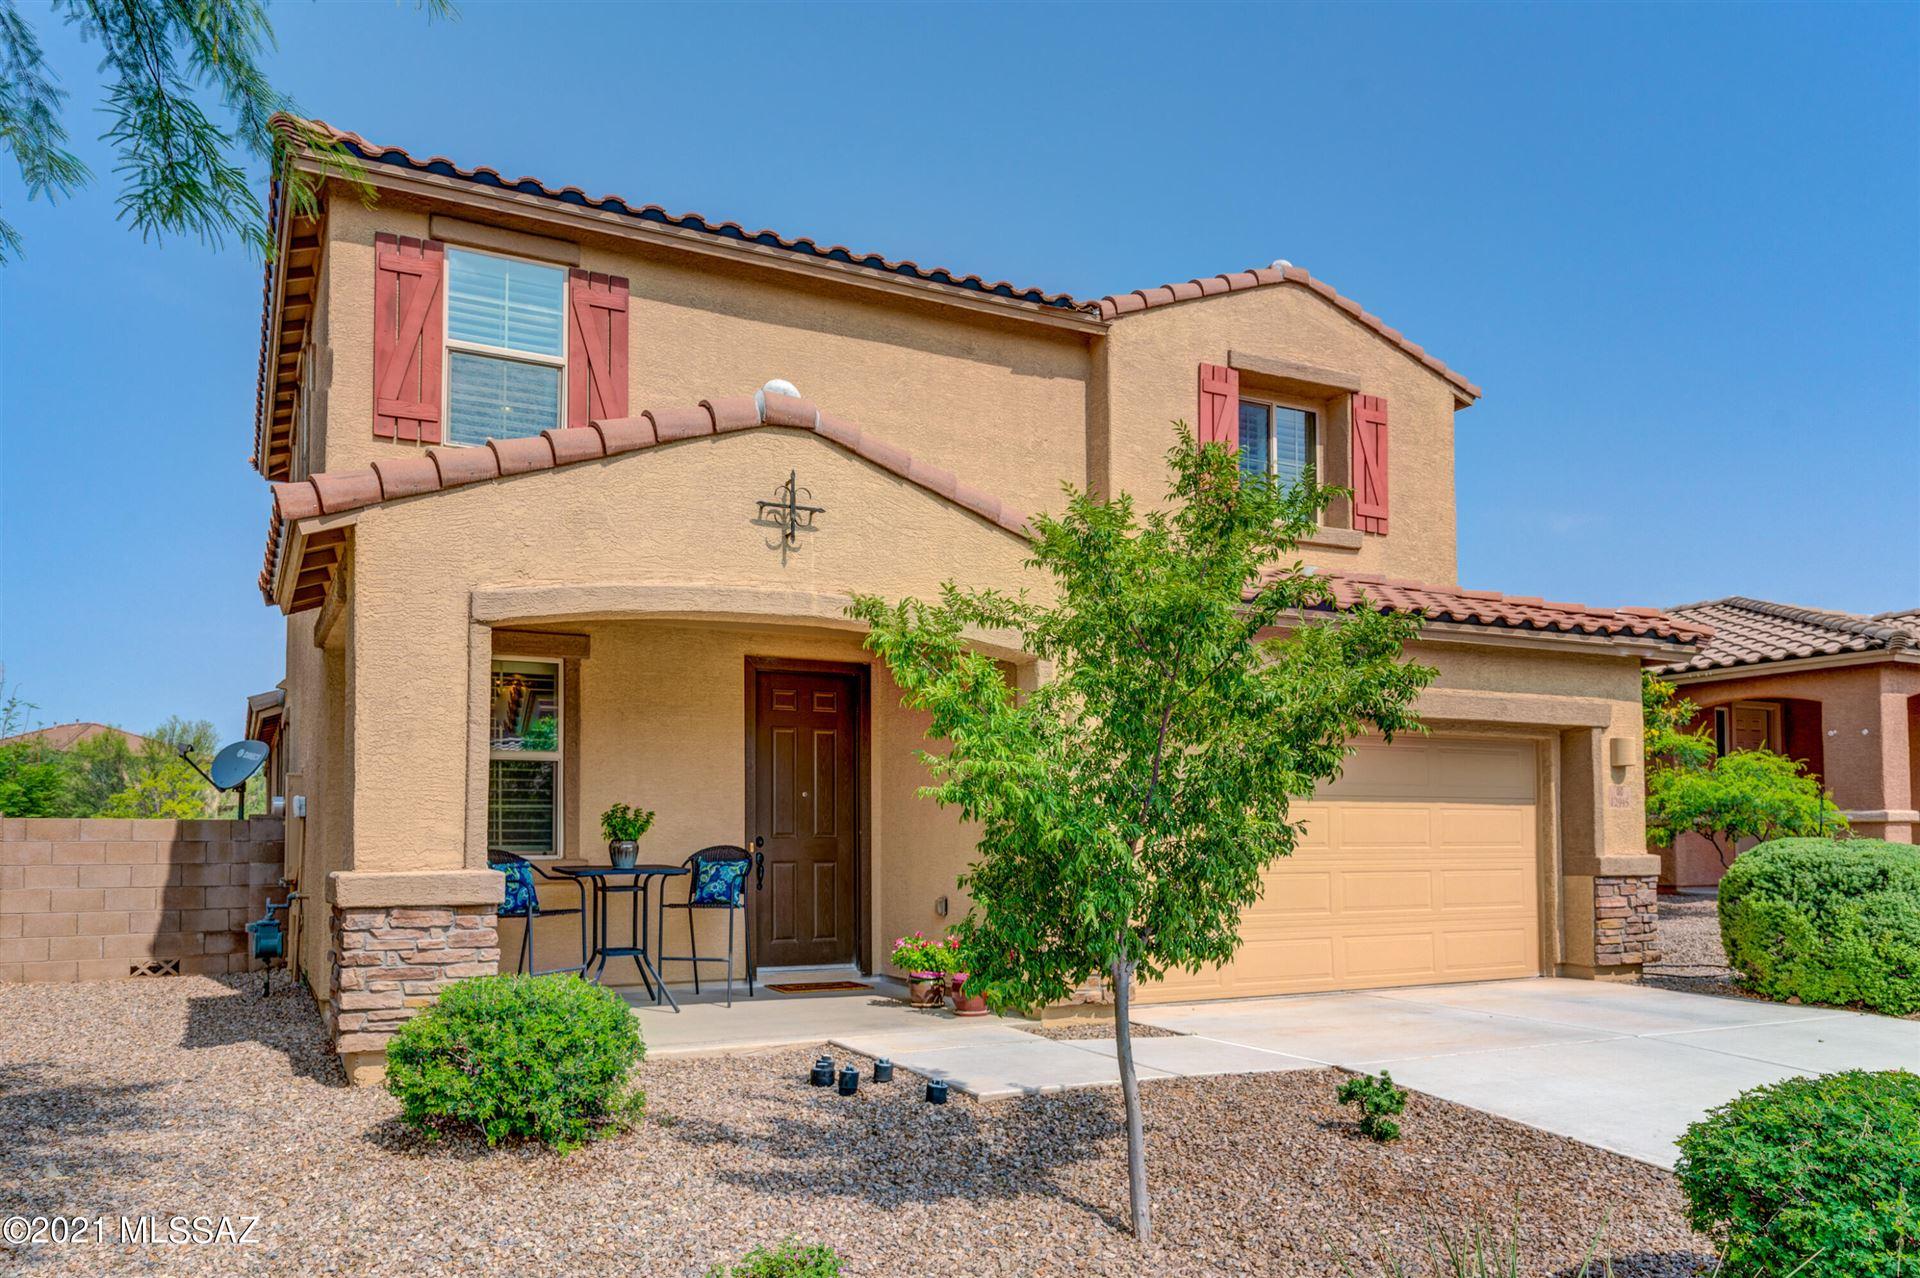 12945 N Indian Palms Drive, Oro Valley, AZ 85755 - MLS#: 22119117